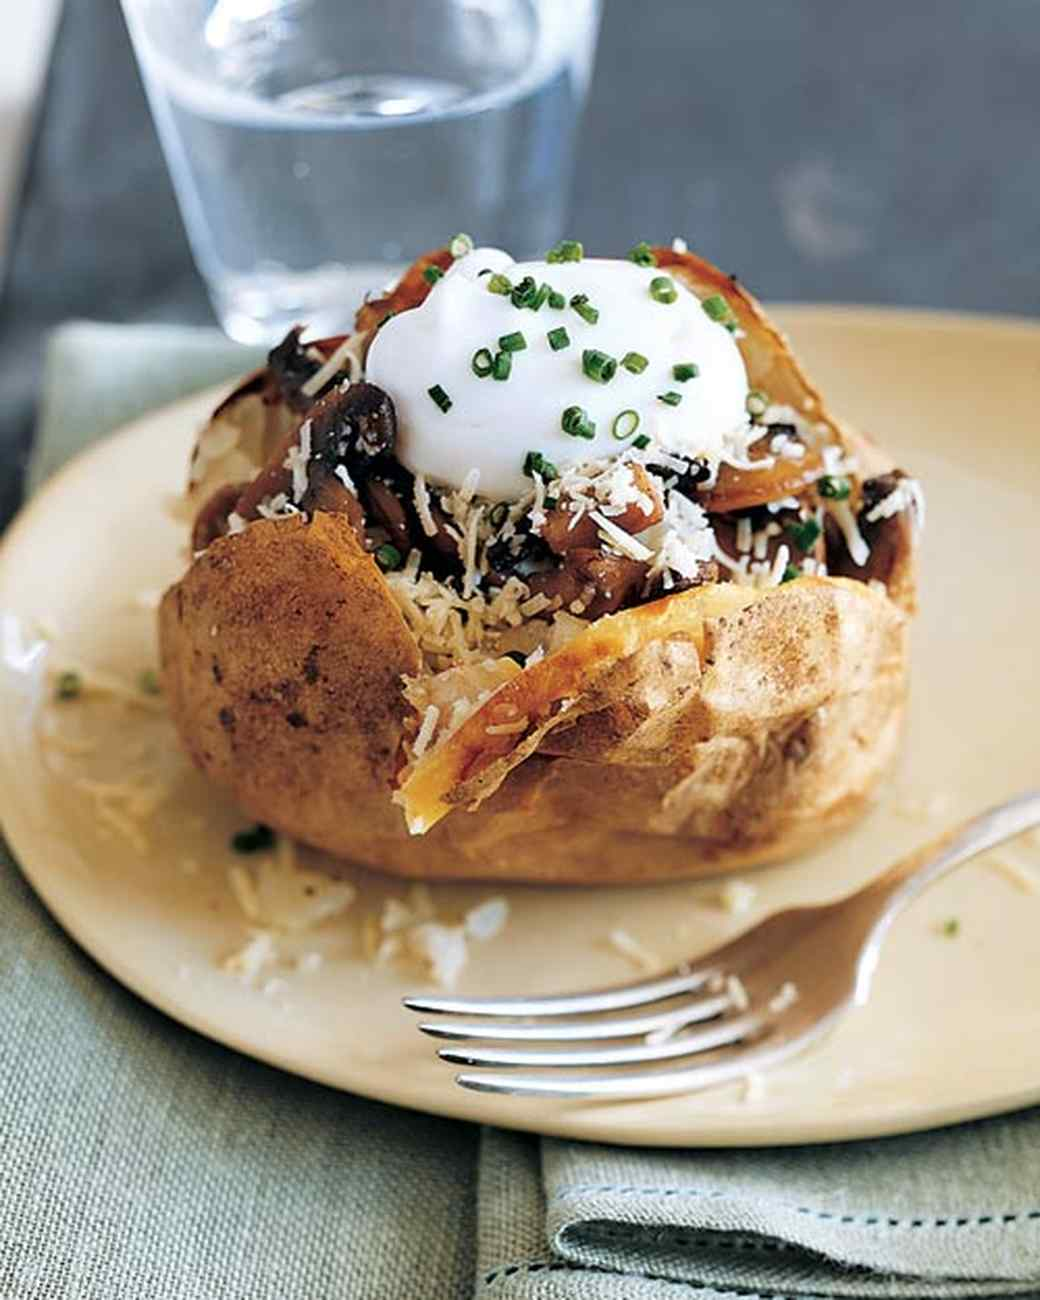 mla1012_0505_baked_potato_sauteed_mushrooms.jpg